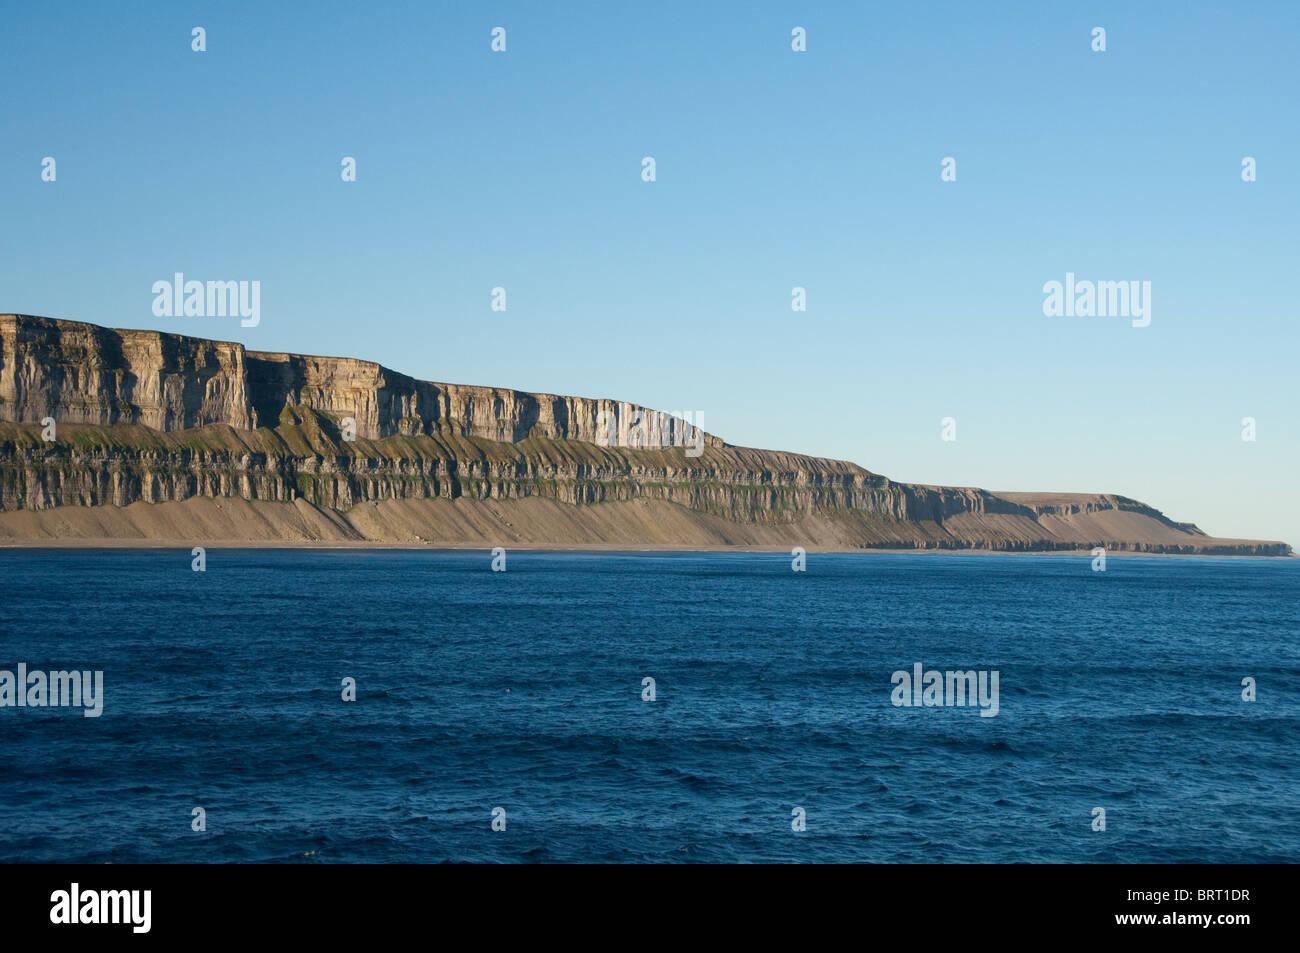 Canada, Nunavut, Qikiqtaaluk Region, Akpatok Island. - Stock Image